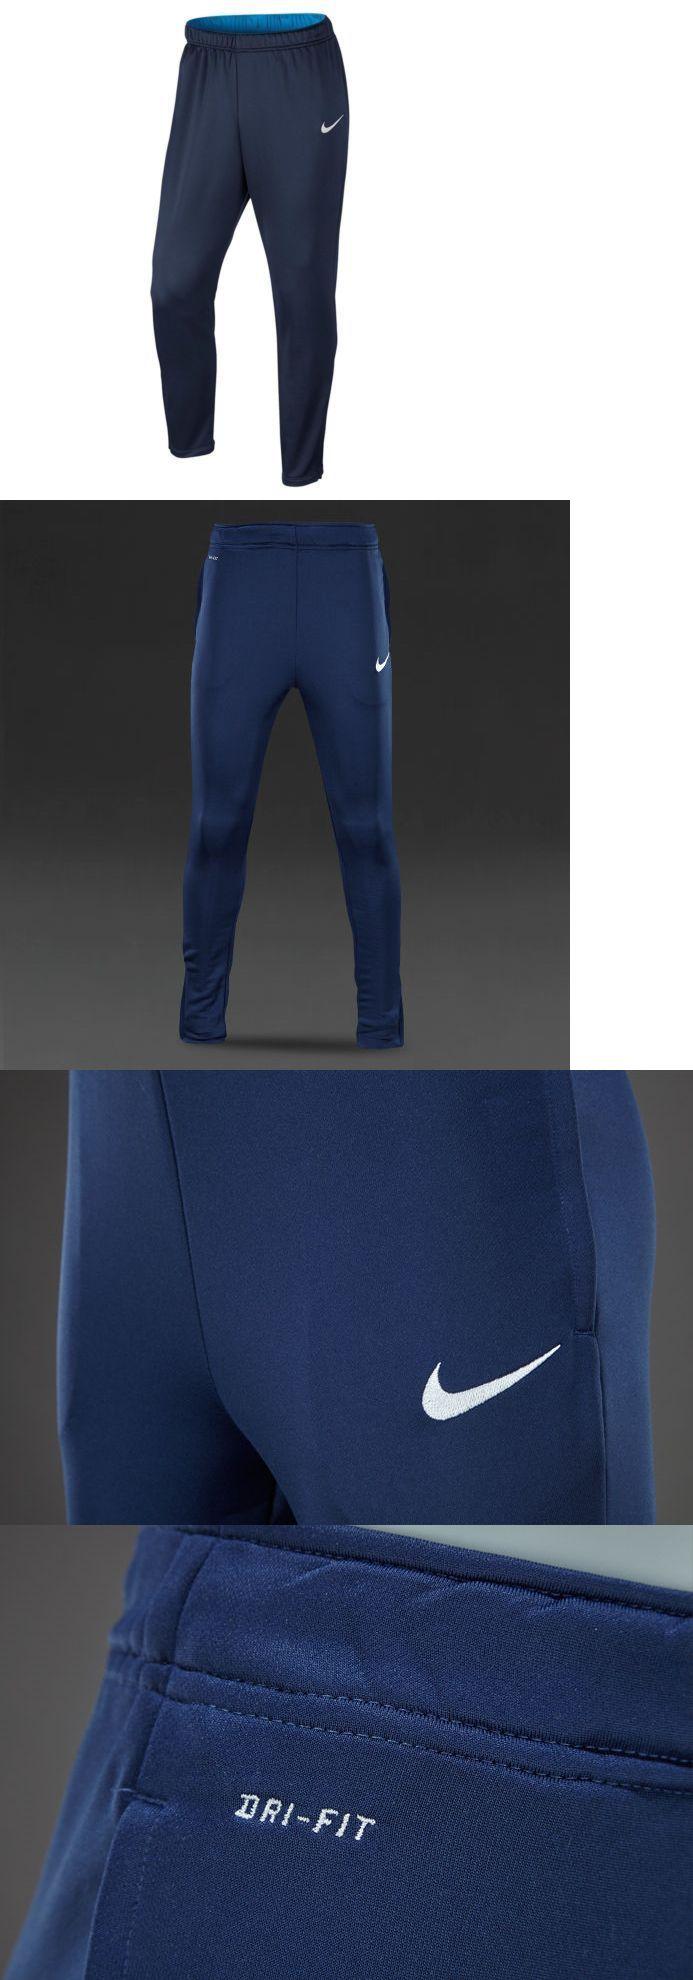 b00f377b Pants 51920: Boys Youth Nike Academy Tech Training Pants 651397 410 ...